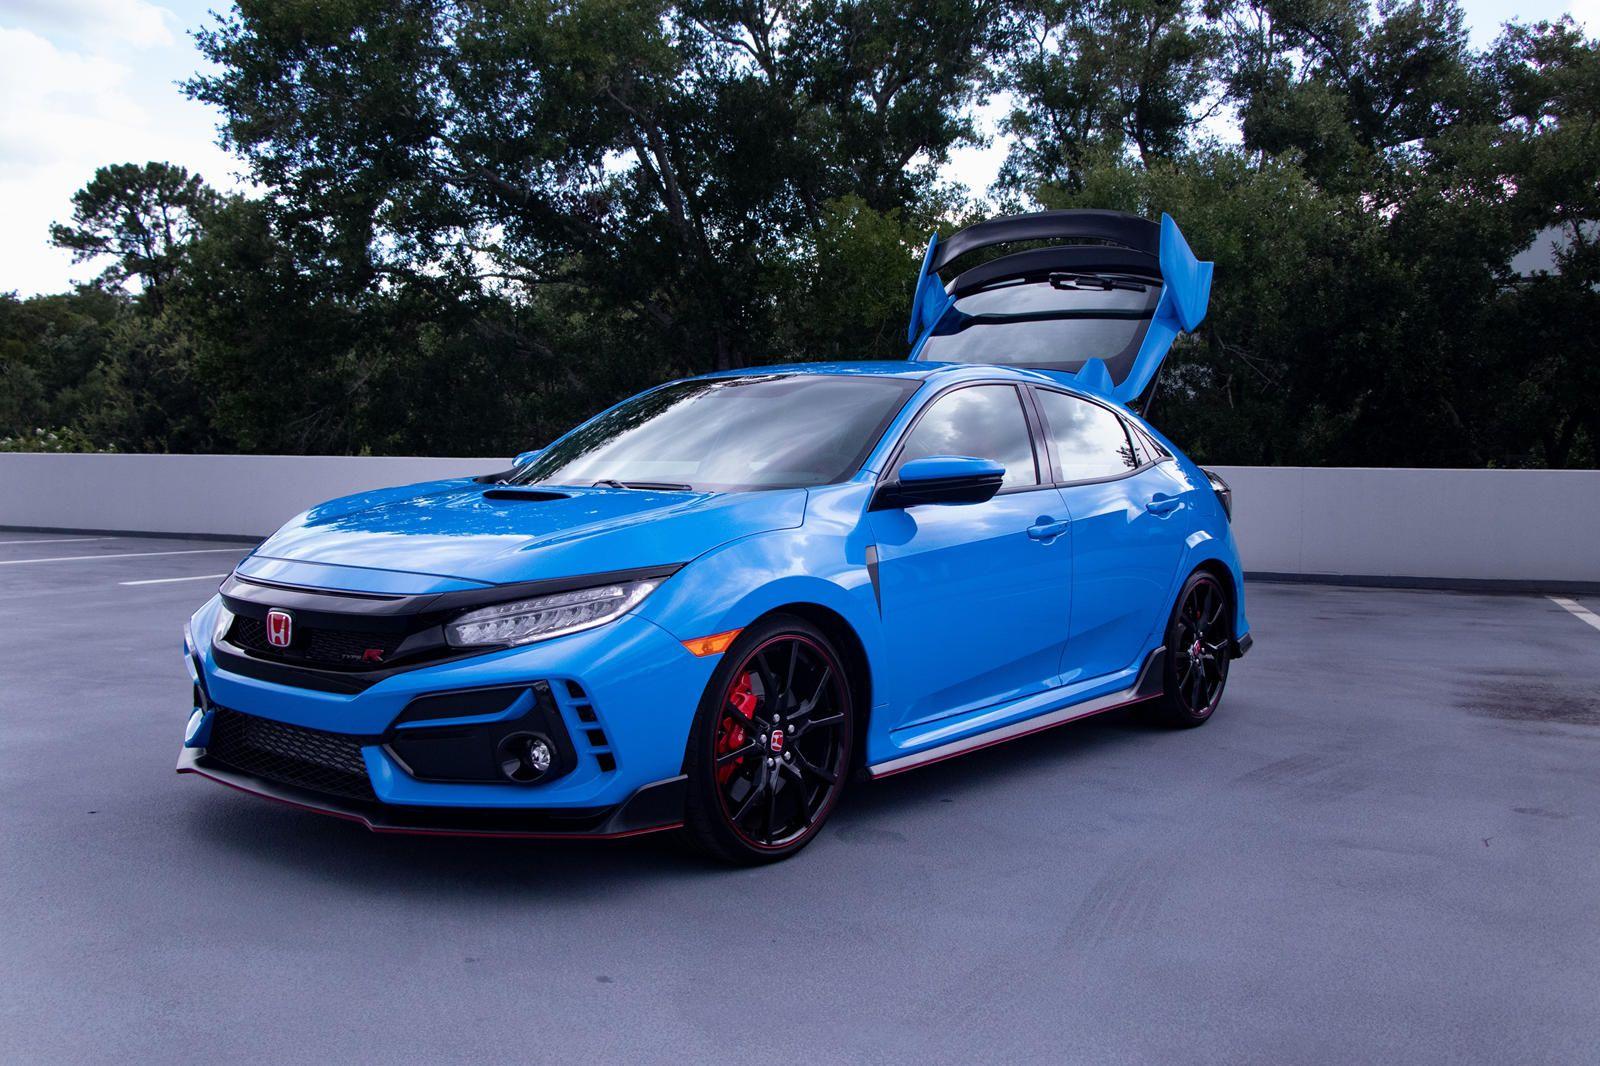 2020 Honda Civic Type R Test Drive A Flawless Hot Hatch Experience In 2020 Honda Civic Type R Honda Civic Civic